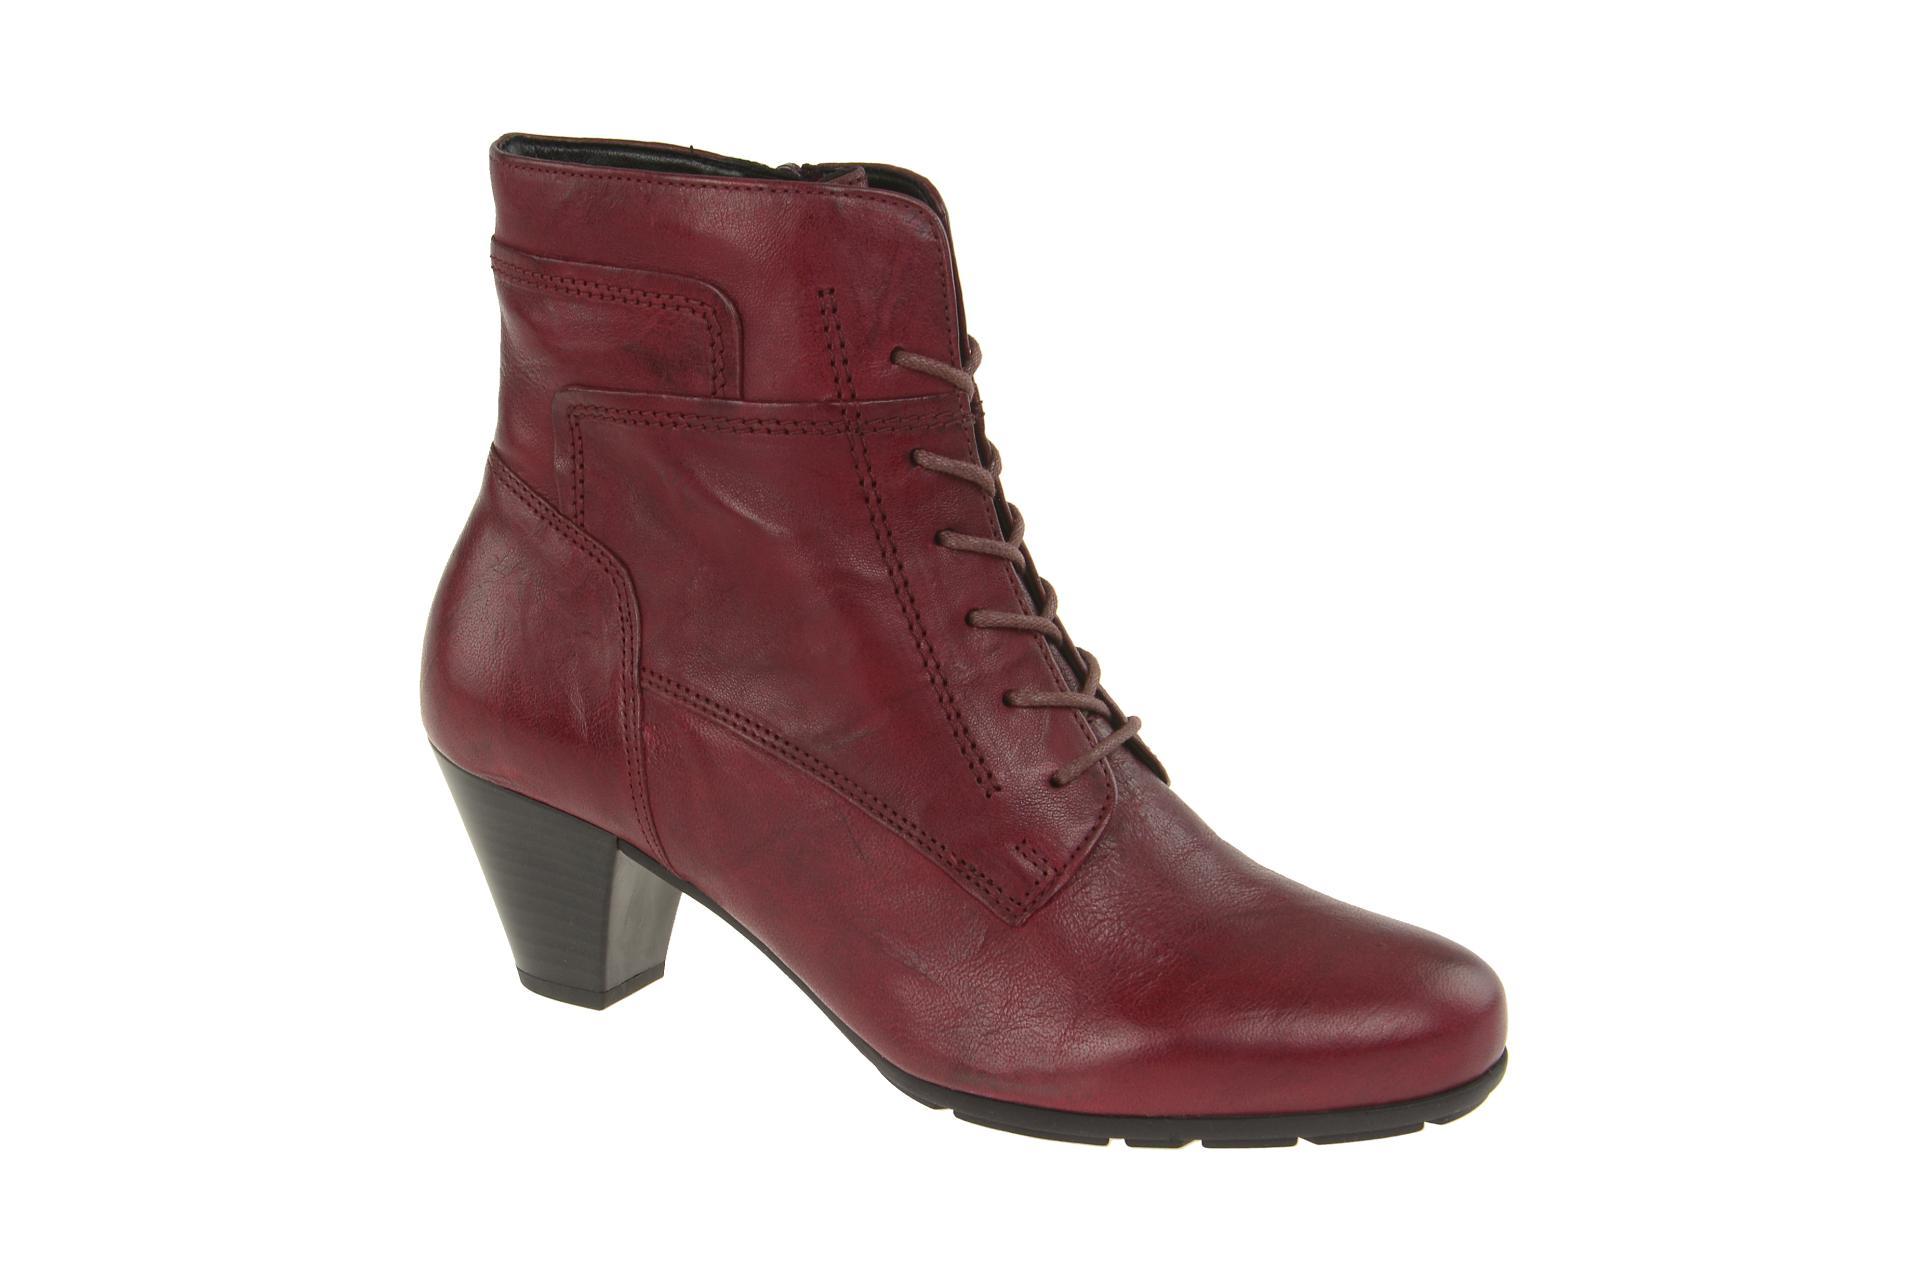 info for 998f4 7e12e Details zu Gabor Schuhe 95.644 rot Damen Stiefeletten elegante Stiefelette  95.644.55 NEU